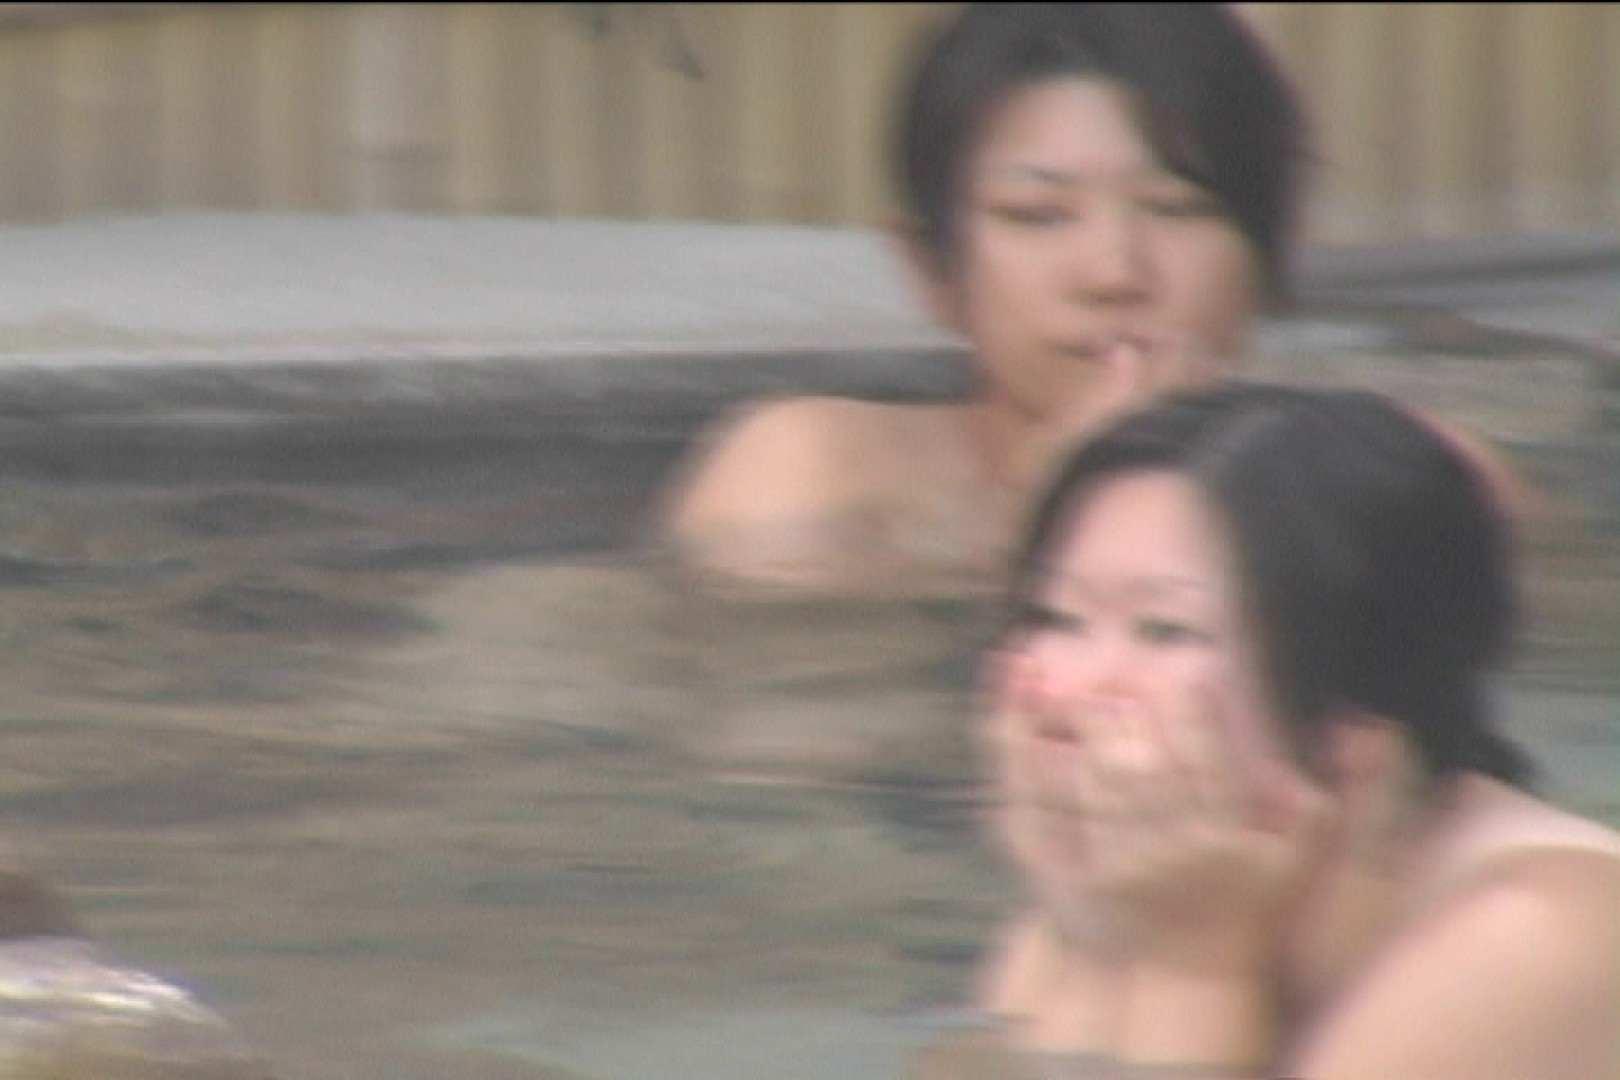 Aquaな露天風呂Vol.527 0  88連発 80